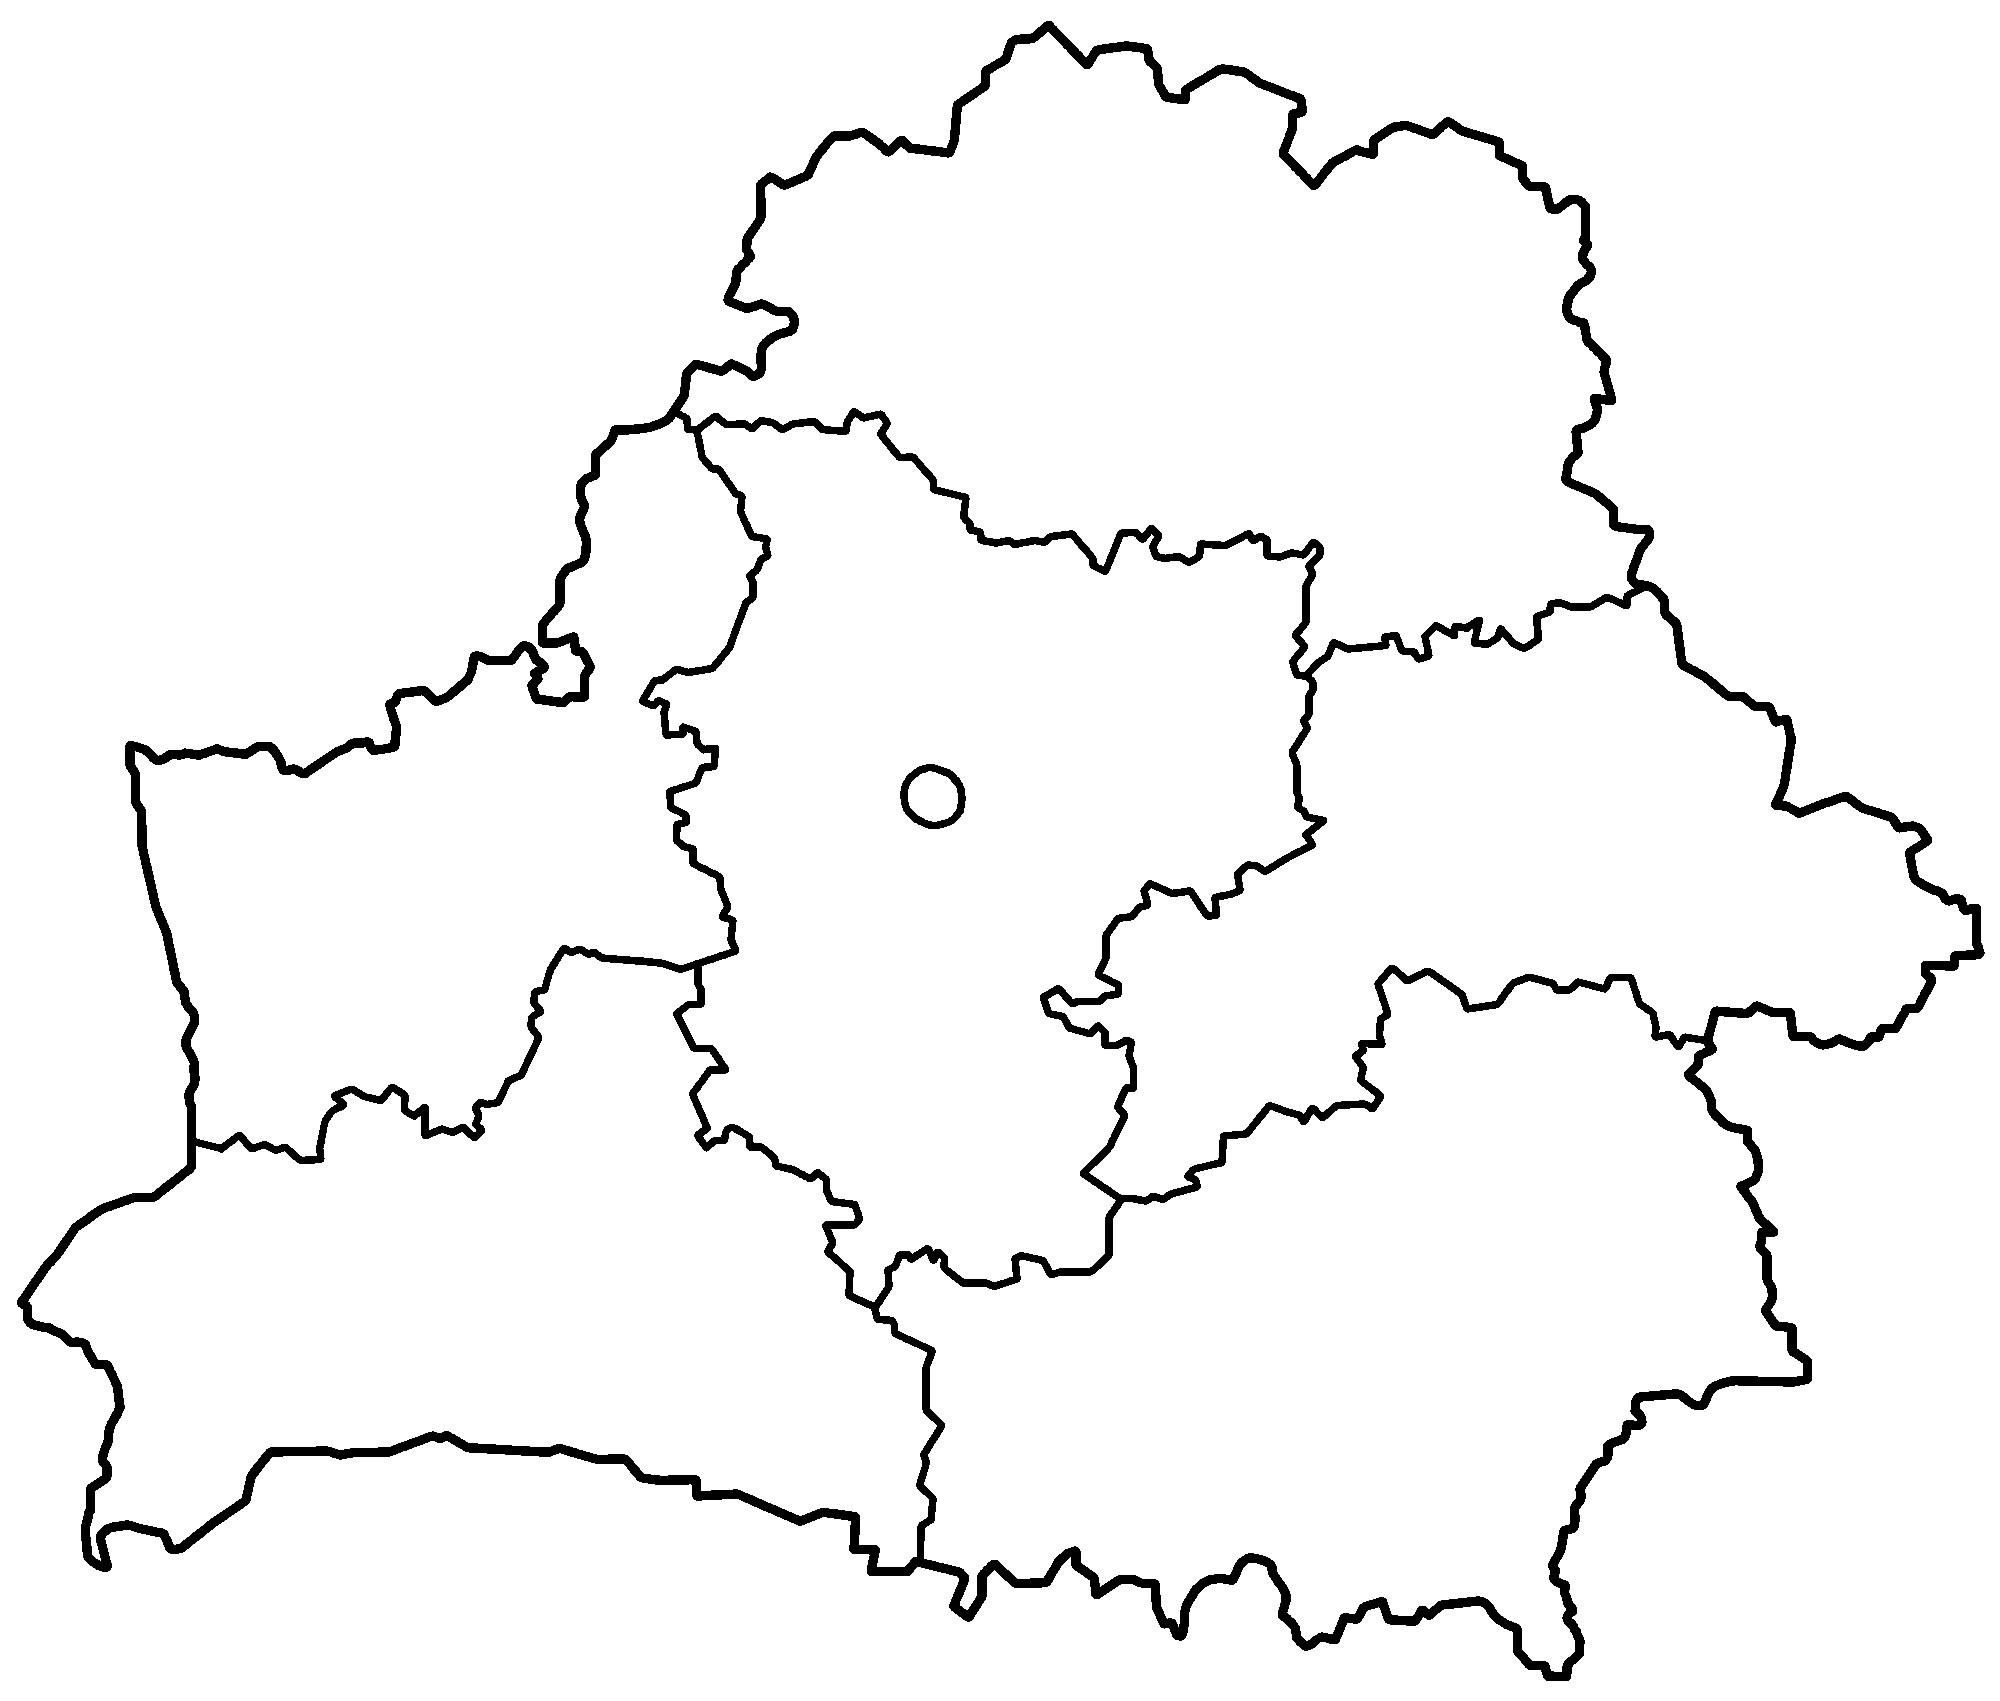 Carte Biélorussie Vierge, Carte Vierge De Biélorussie pour Carte De France Région Vierge